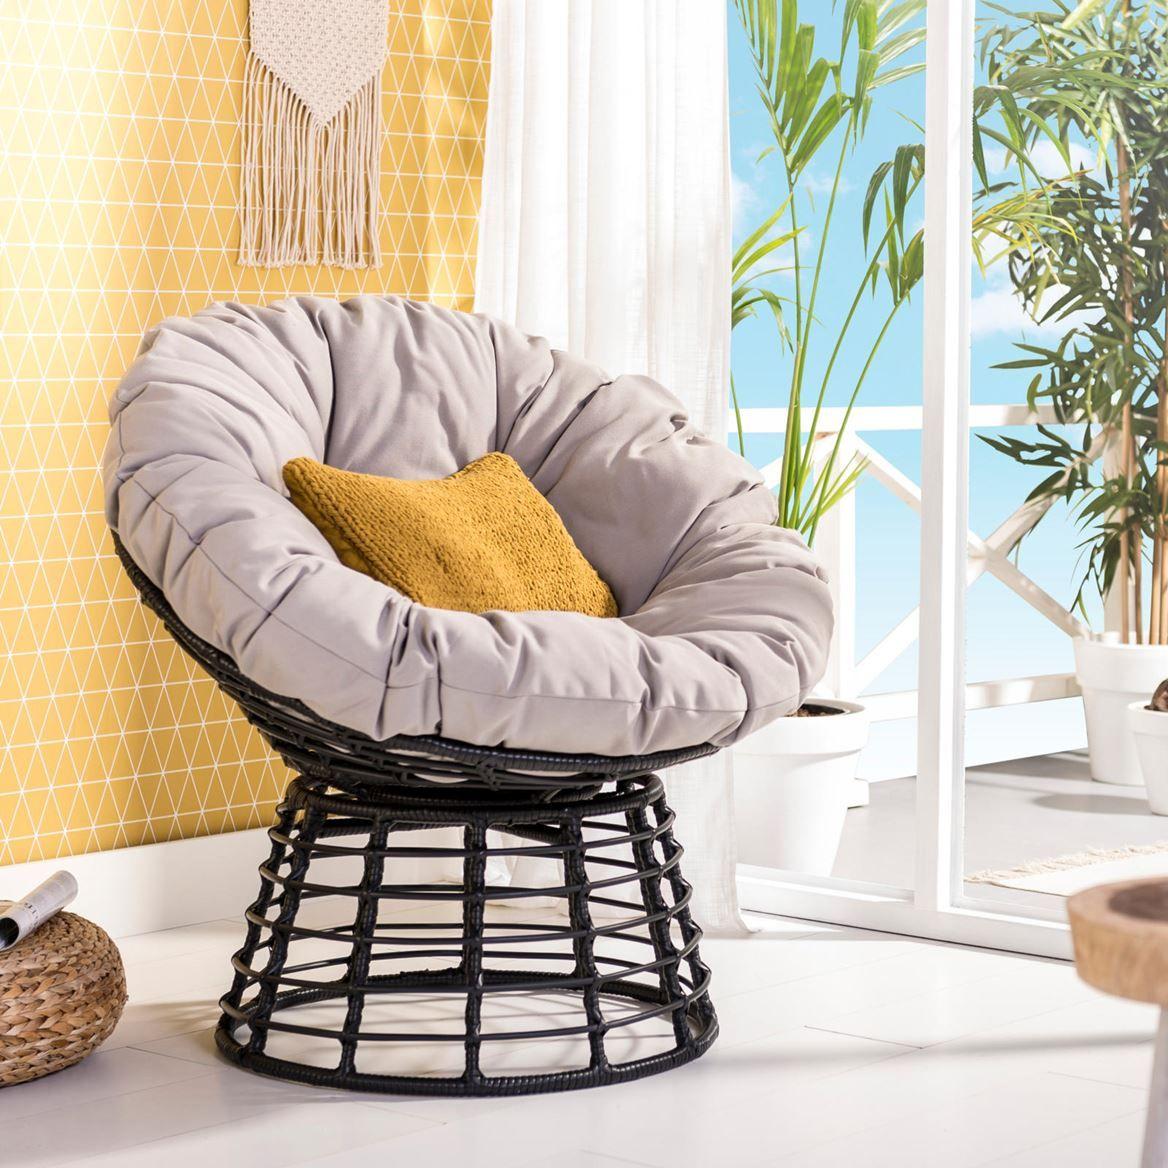 Papasan Outdoor Lounge Chaise Papasan Outdoor Lounge Chaise Stoelen Stoel Grijs Tuinstoelen